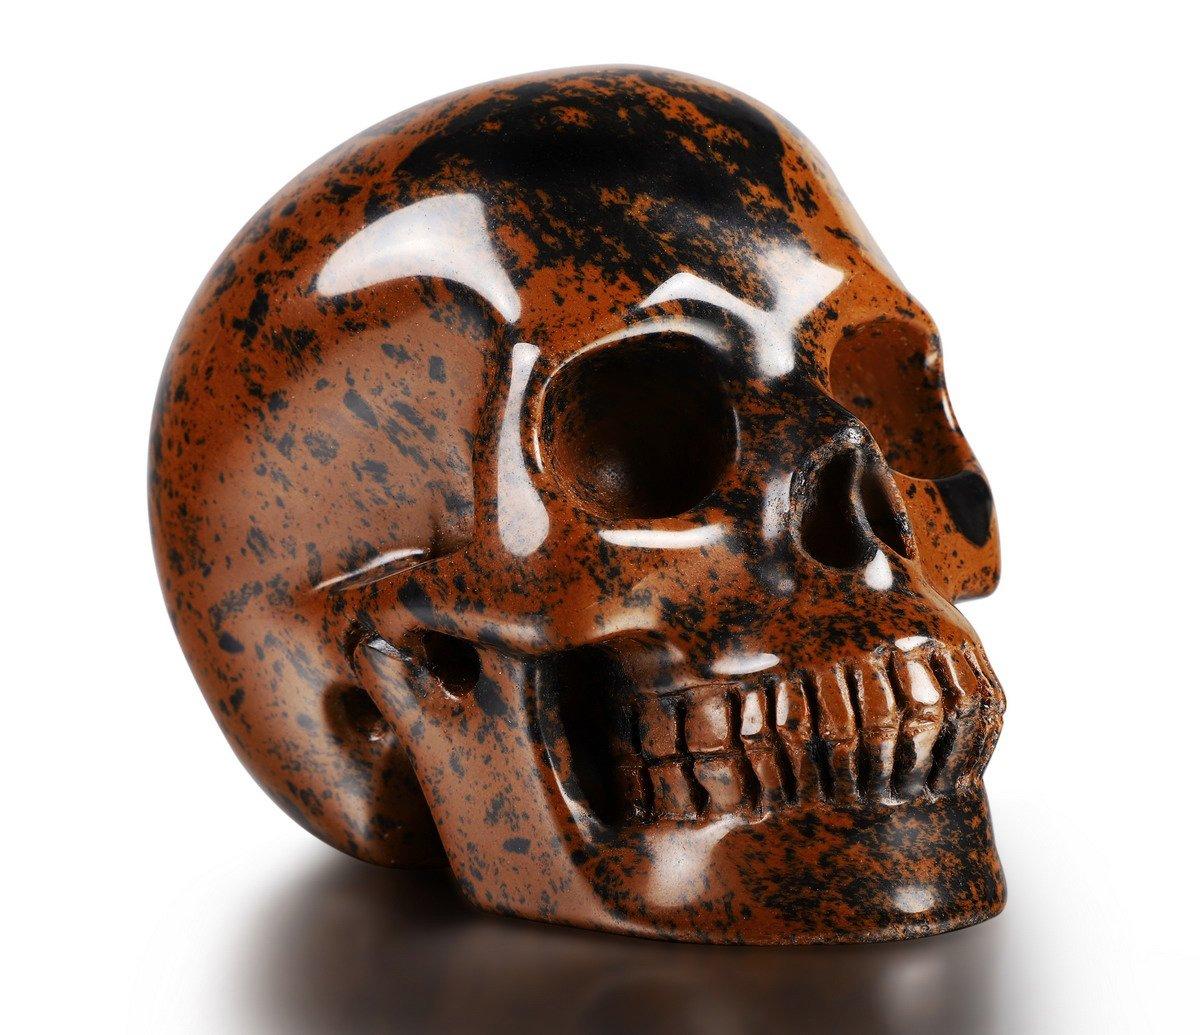 Skullis 2.0-3.0 Mahogany Obsidian Crystal Skull. Hand Carved Gemstone Fine Art Sculpture, Reiki Healing Stone Statue.